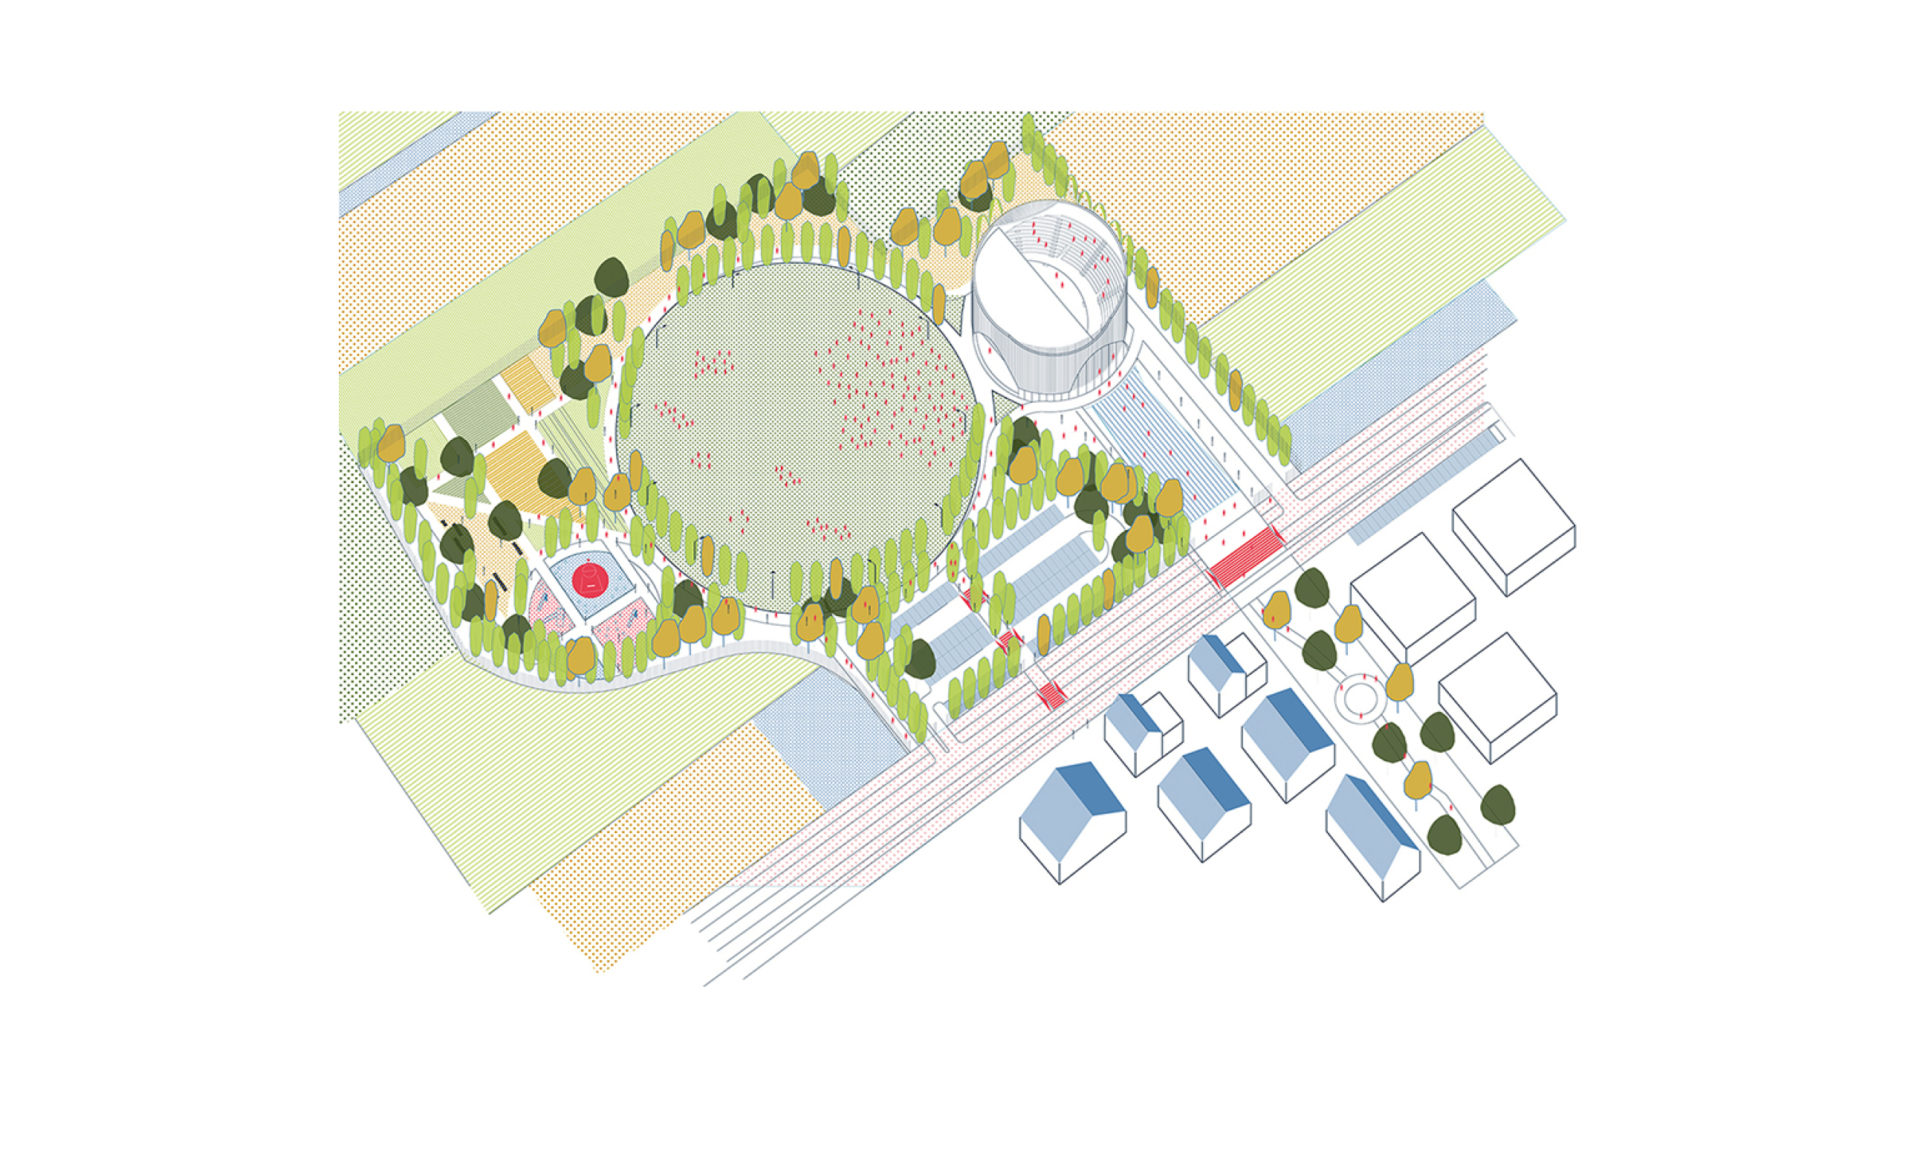 un nuovo teatro, un nuovo parco - Albignasego